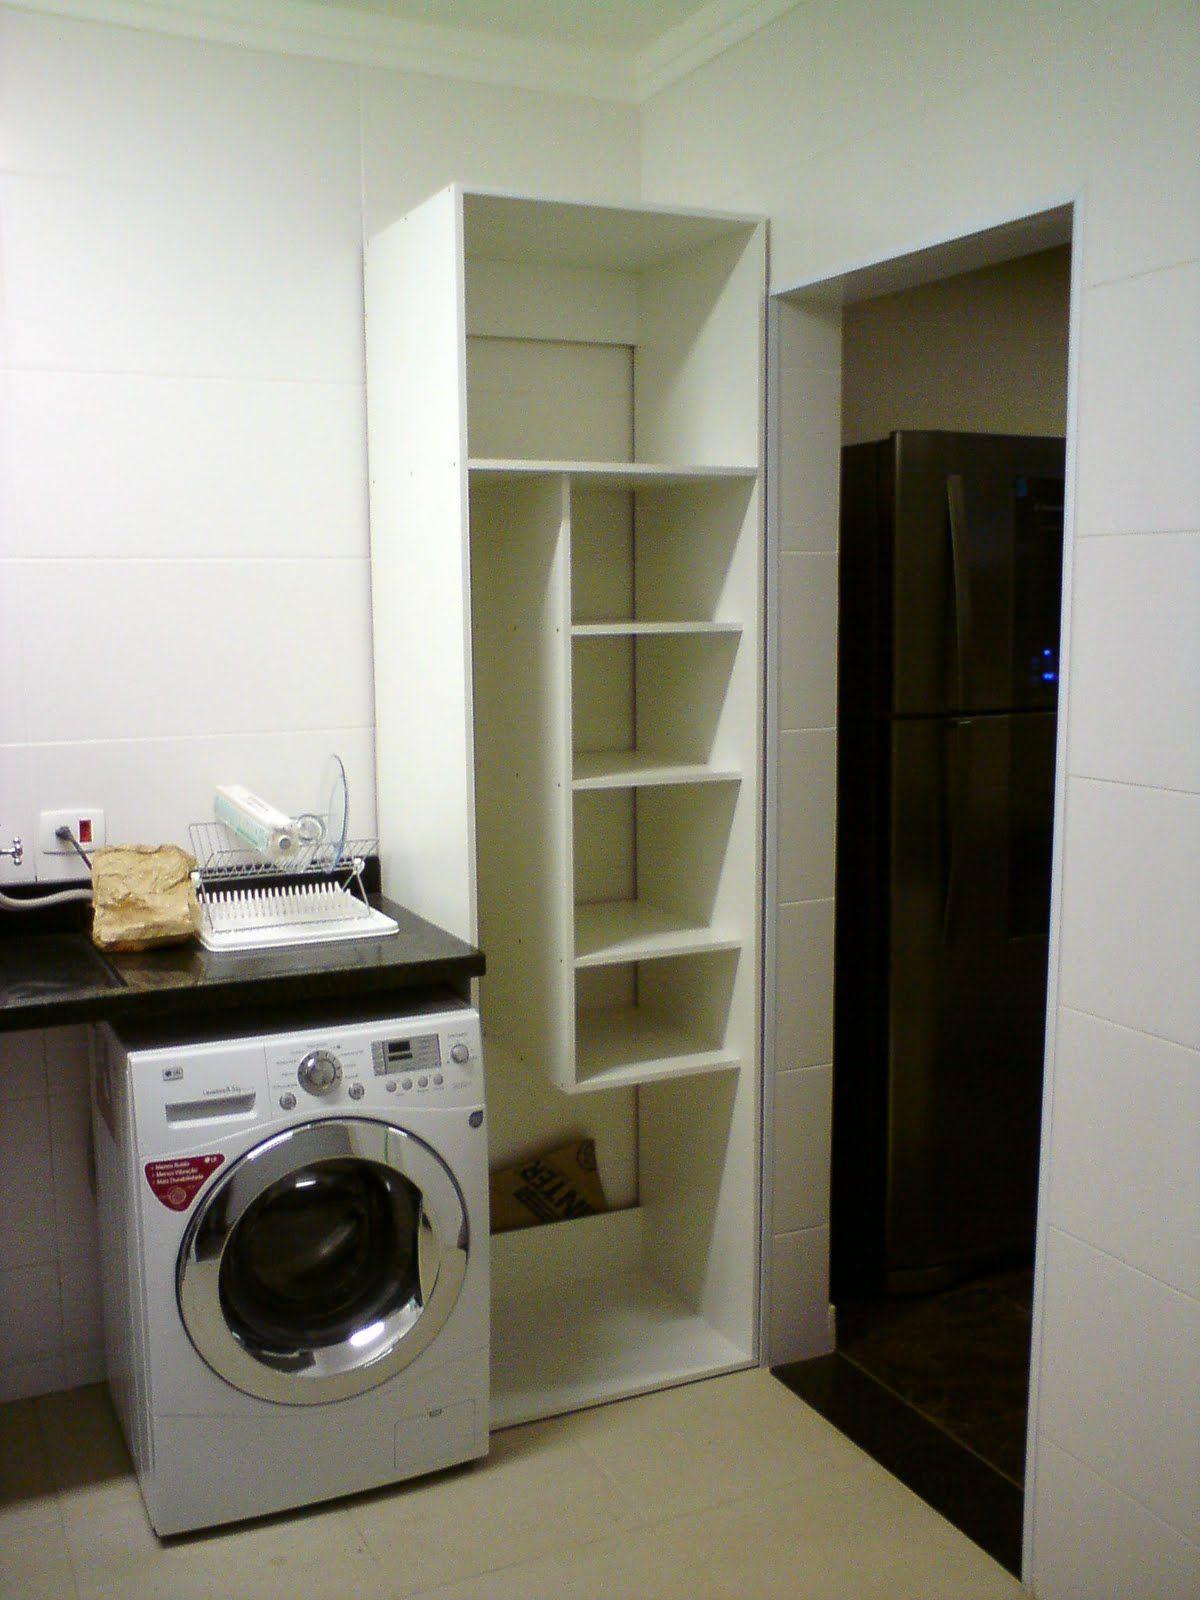 Adesivo De Roda ~ armario lavanderia Ideias inspiradoras Pinterest Armario lavanderia, Lavanderia e Armário